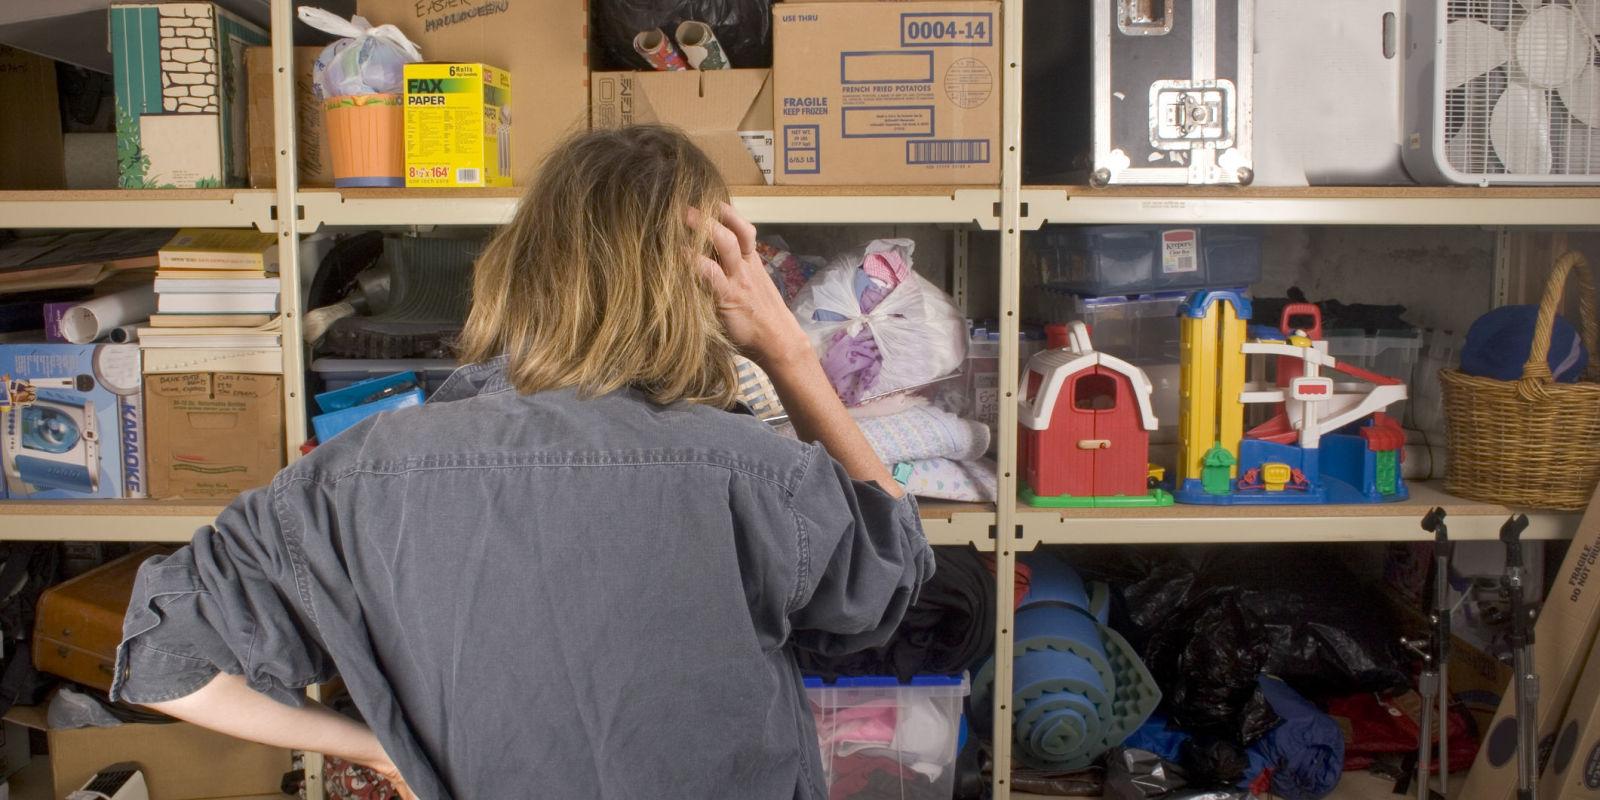 landscape-1471628212-woman-garage-mmessy-shelves-clutter (1).jpg